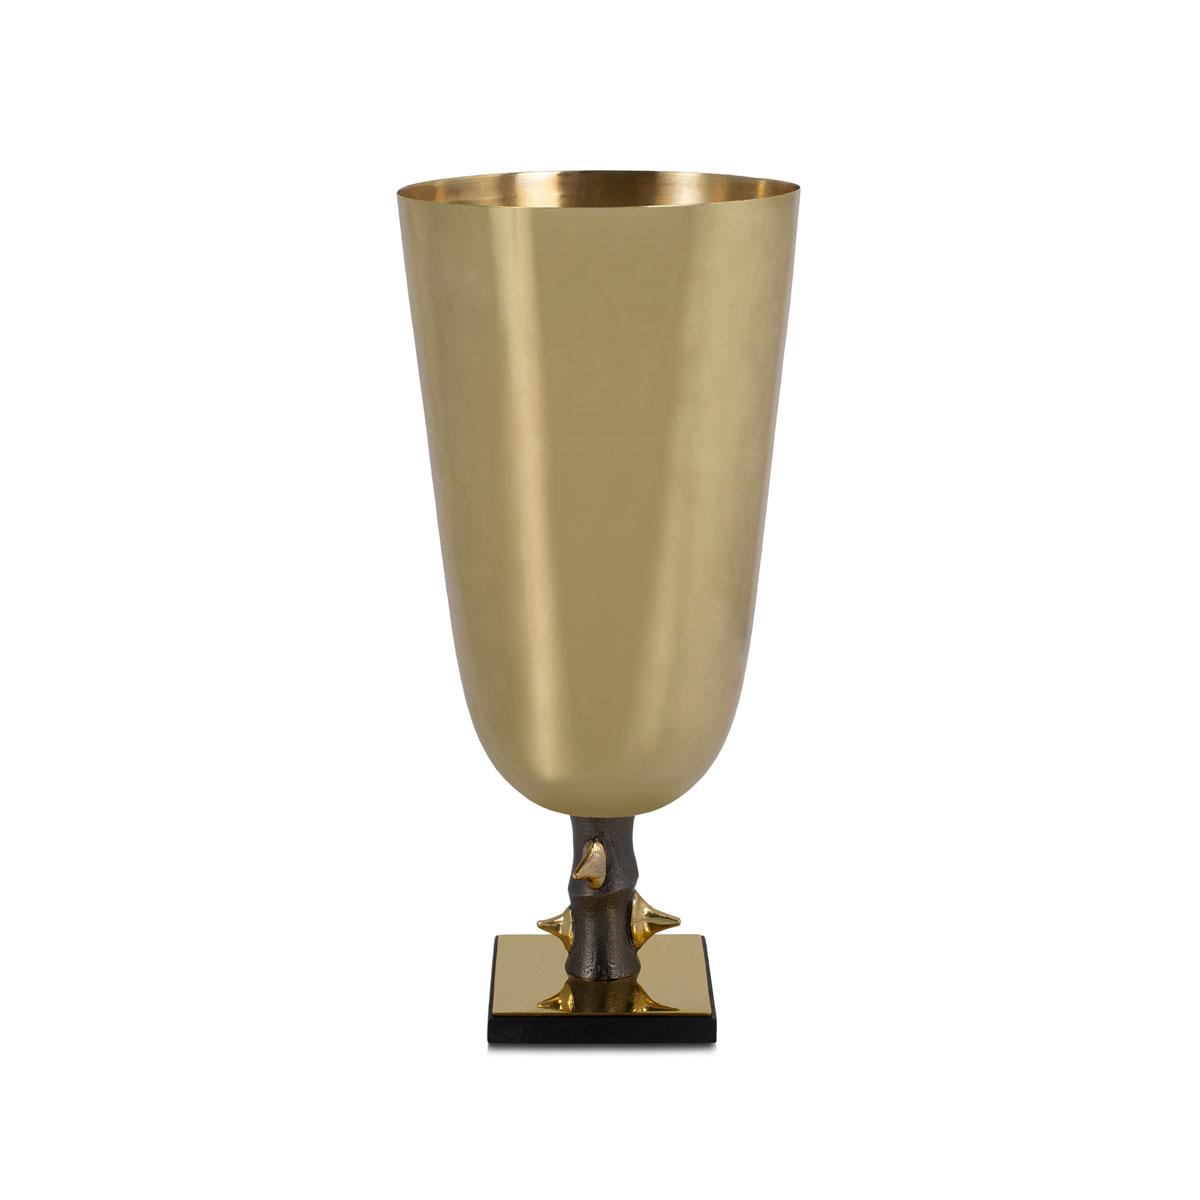 "Michael Aram Thorn 10"" Vase"